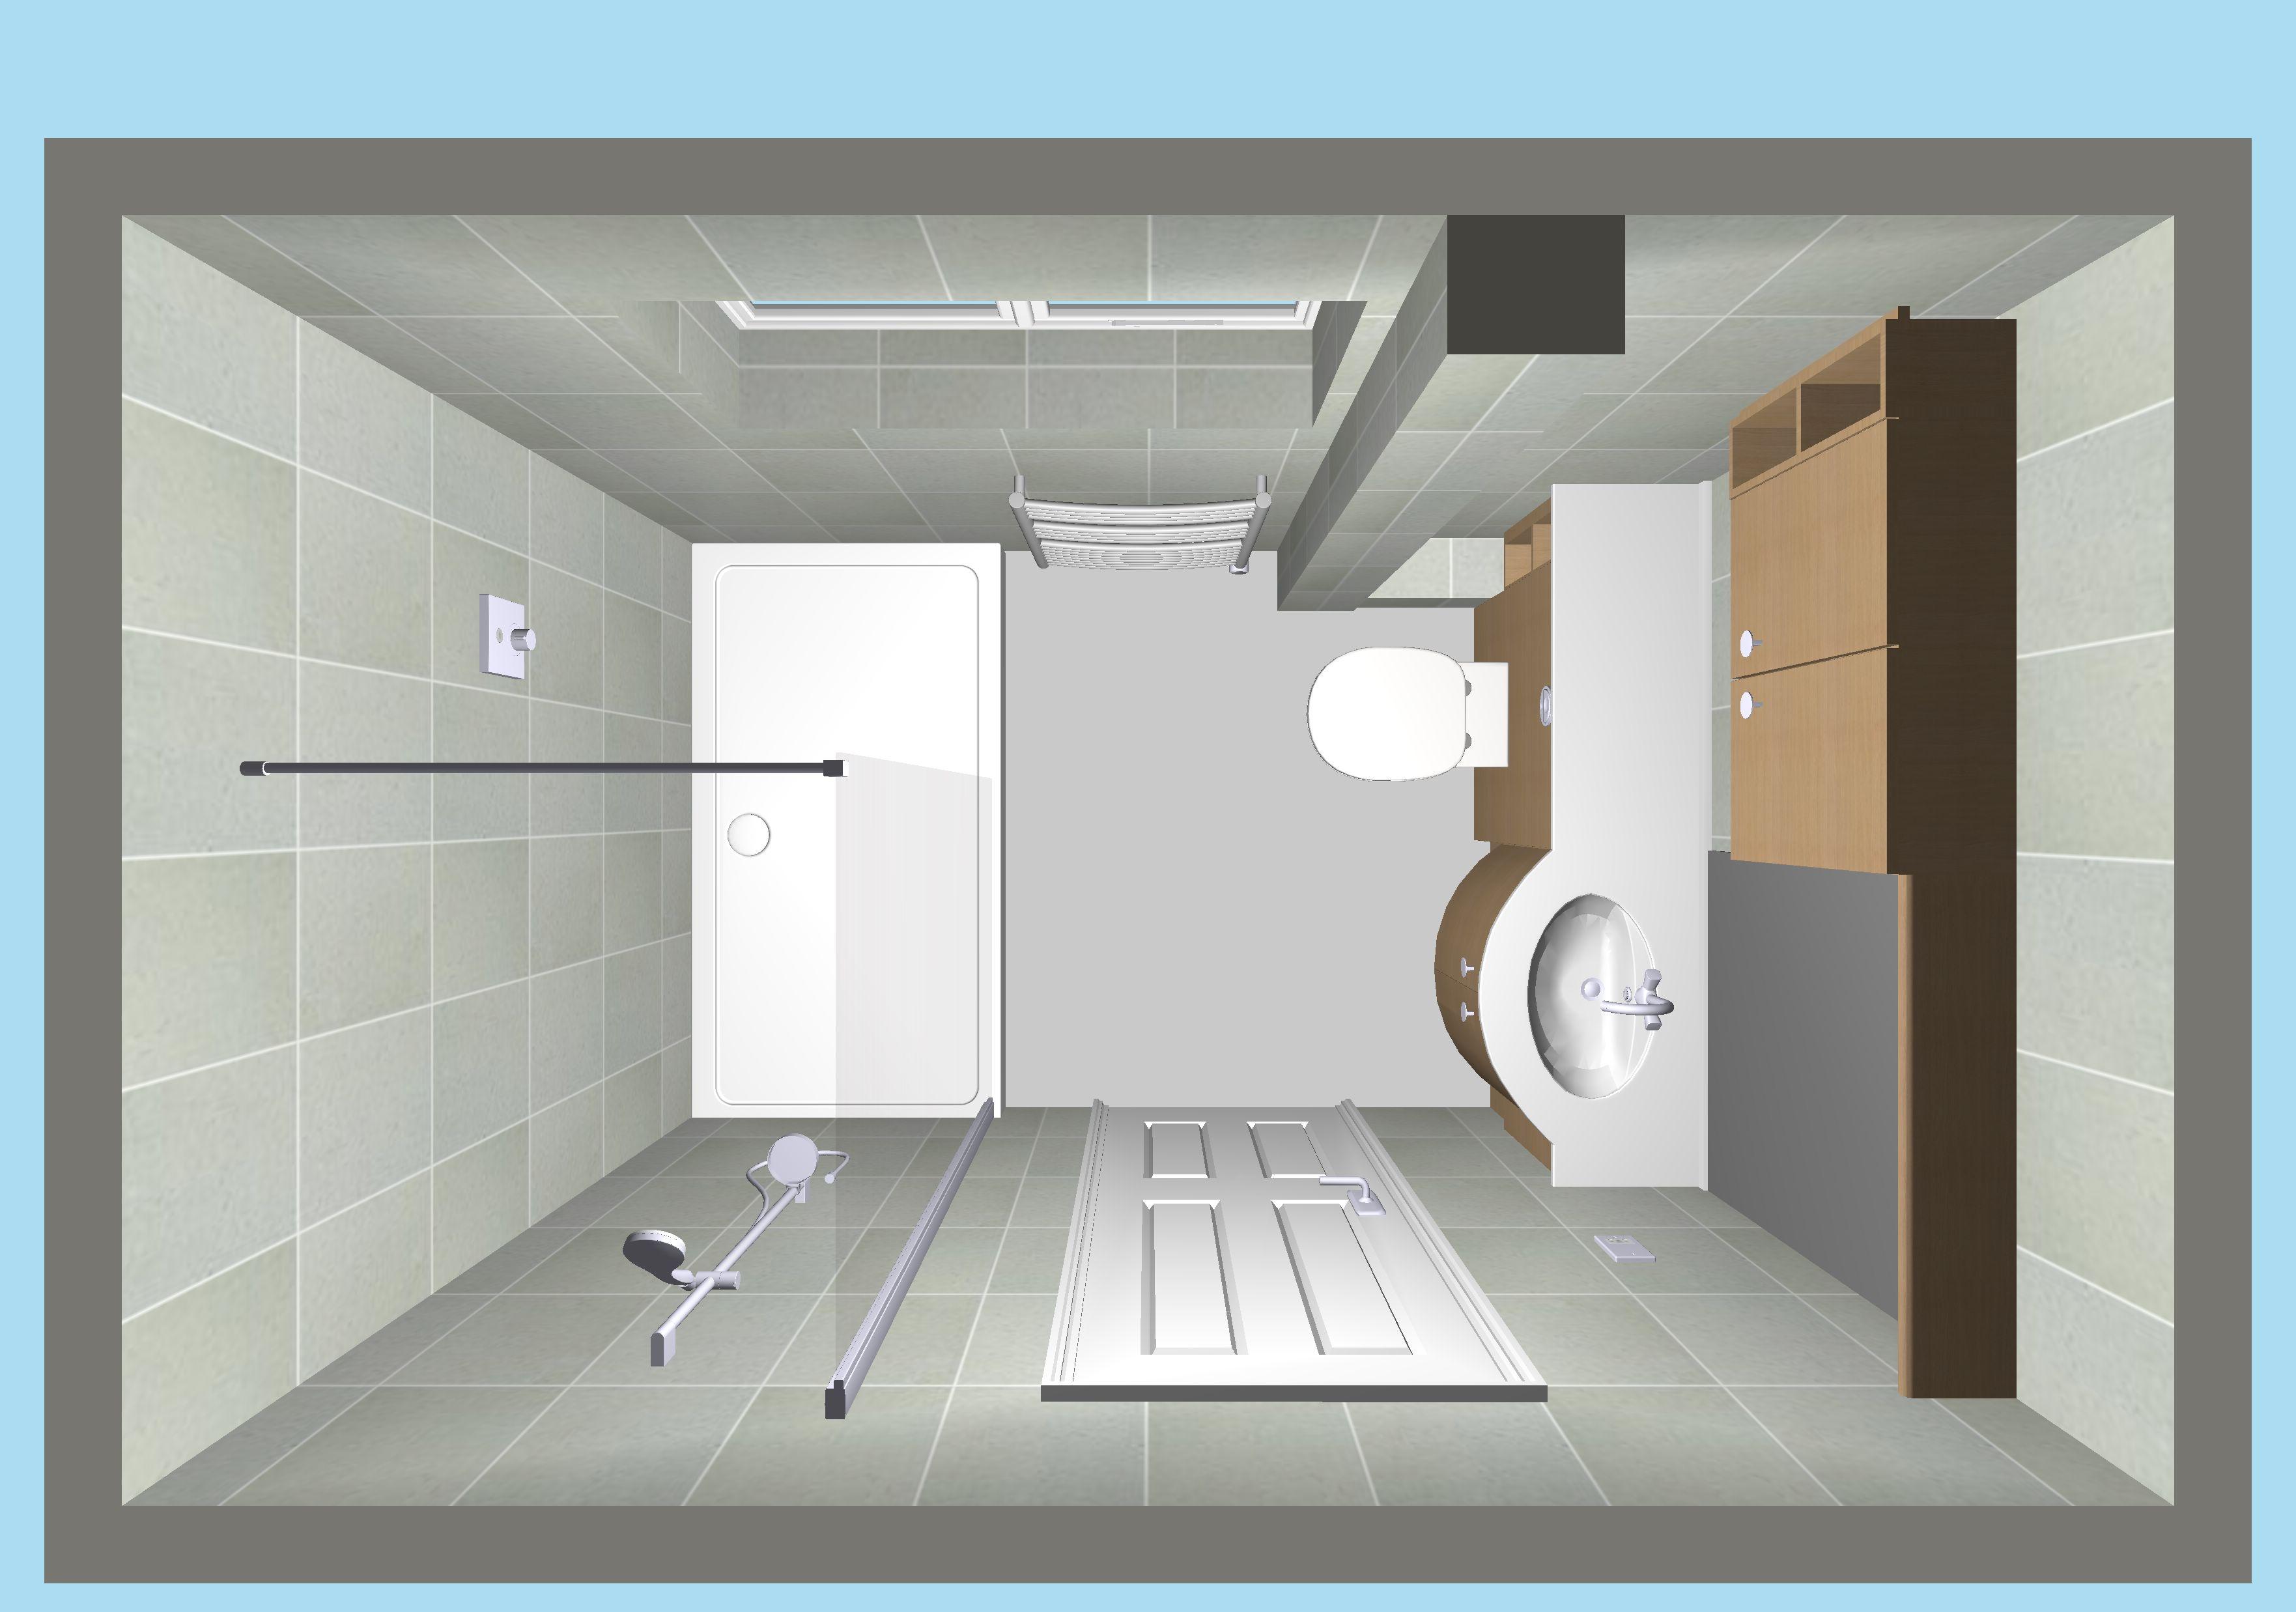 large walk in shower at curtis brothers bathrooms. Black Bedroom Furniture Sets. Home Design Ideas